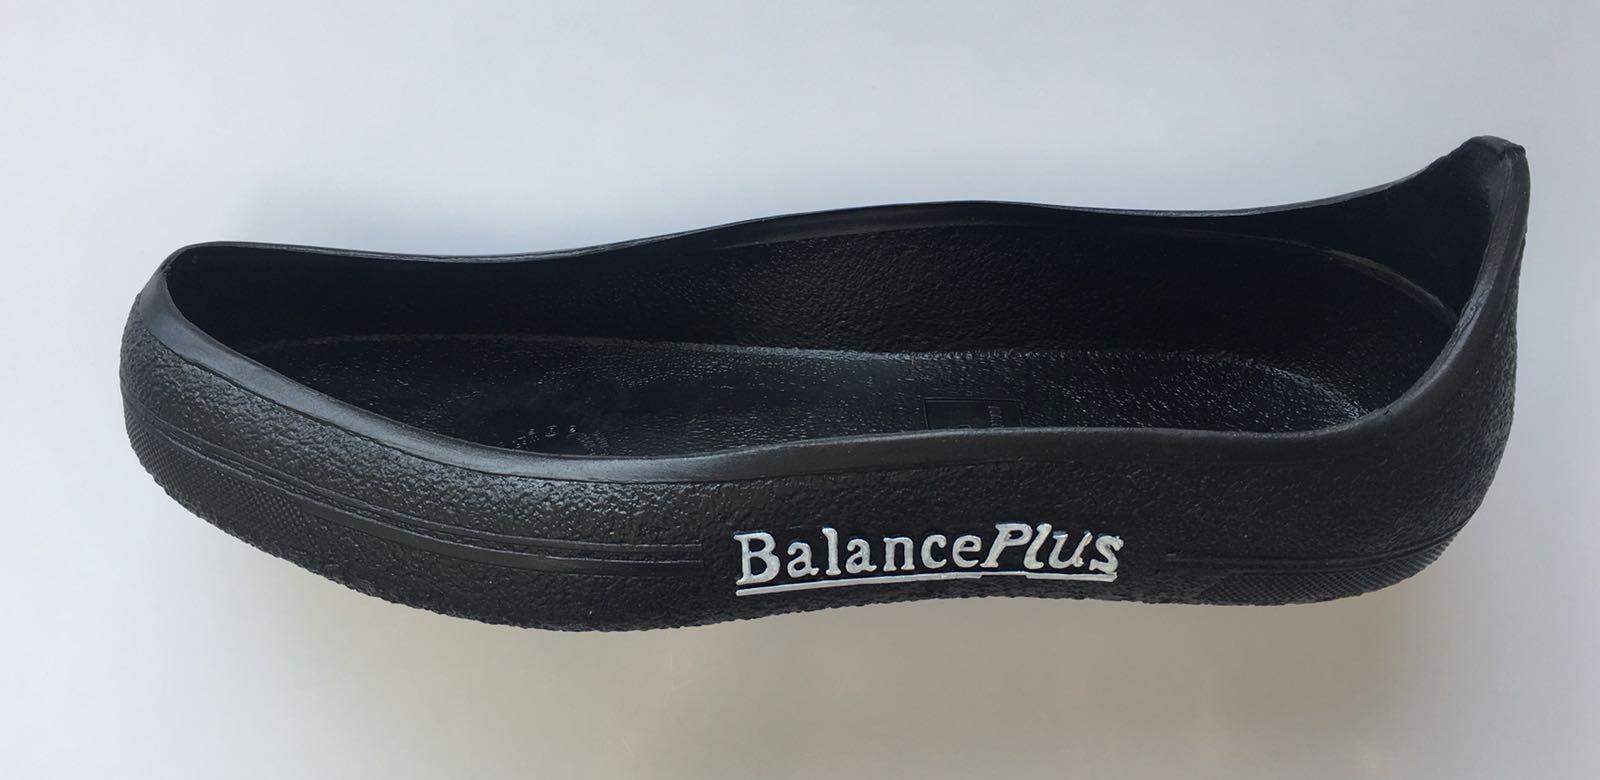 Balanceplus Black Anti Slider Unifoot Xxl Wagners